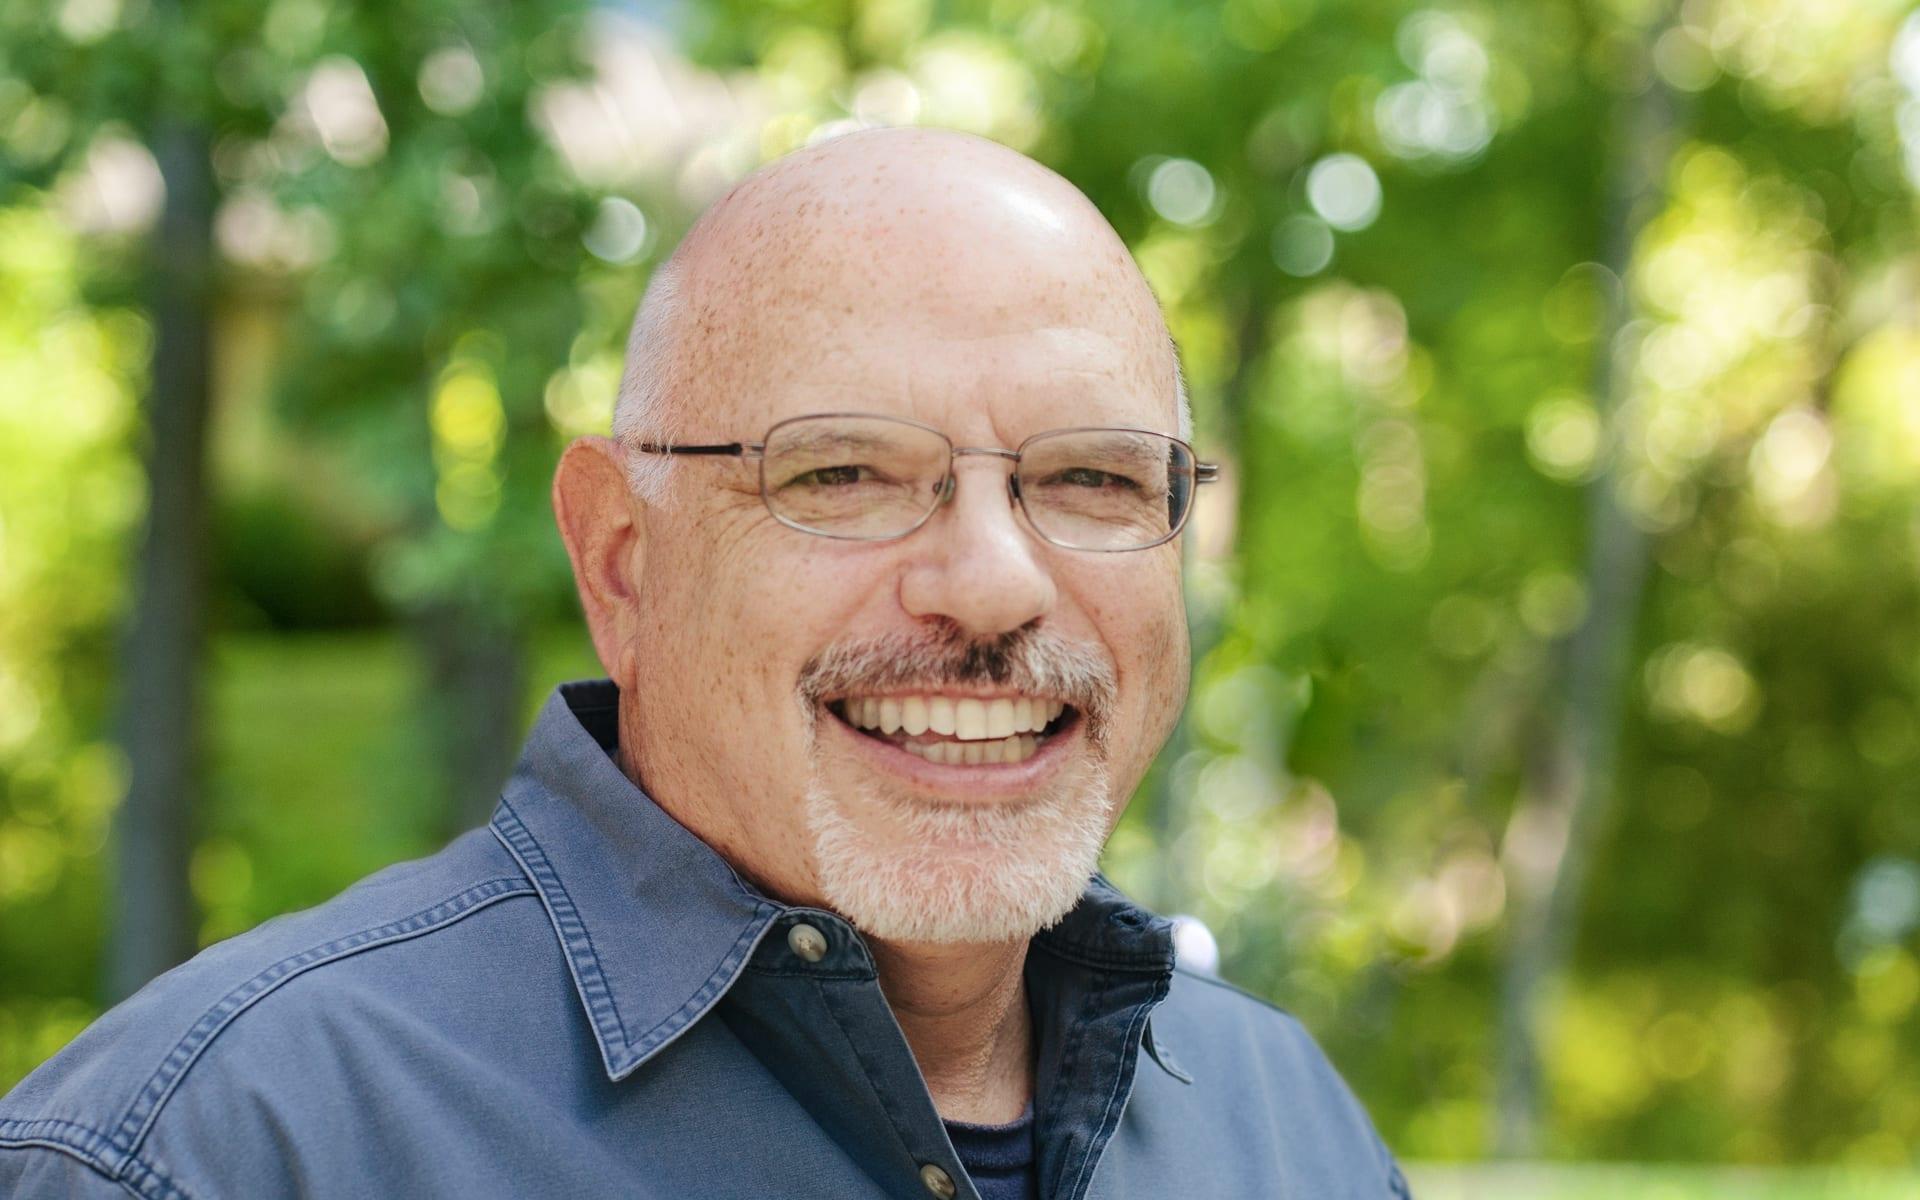 Michael Rydelnik